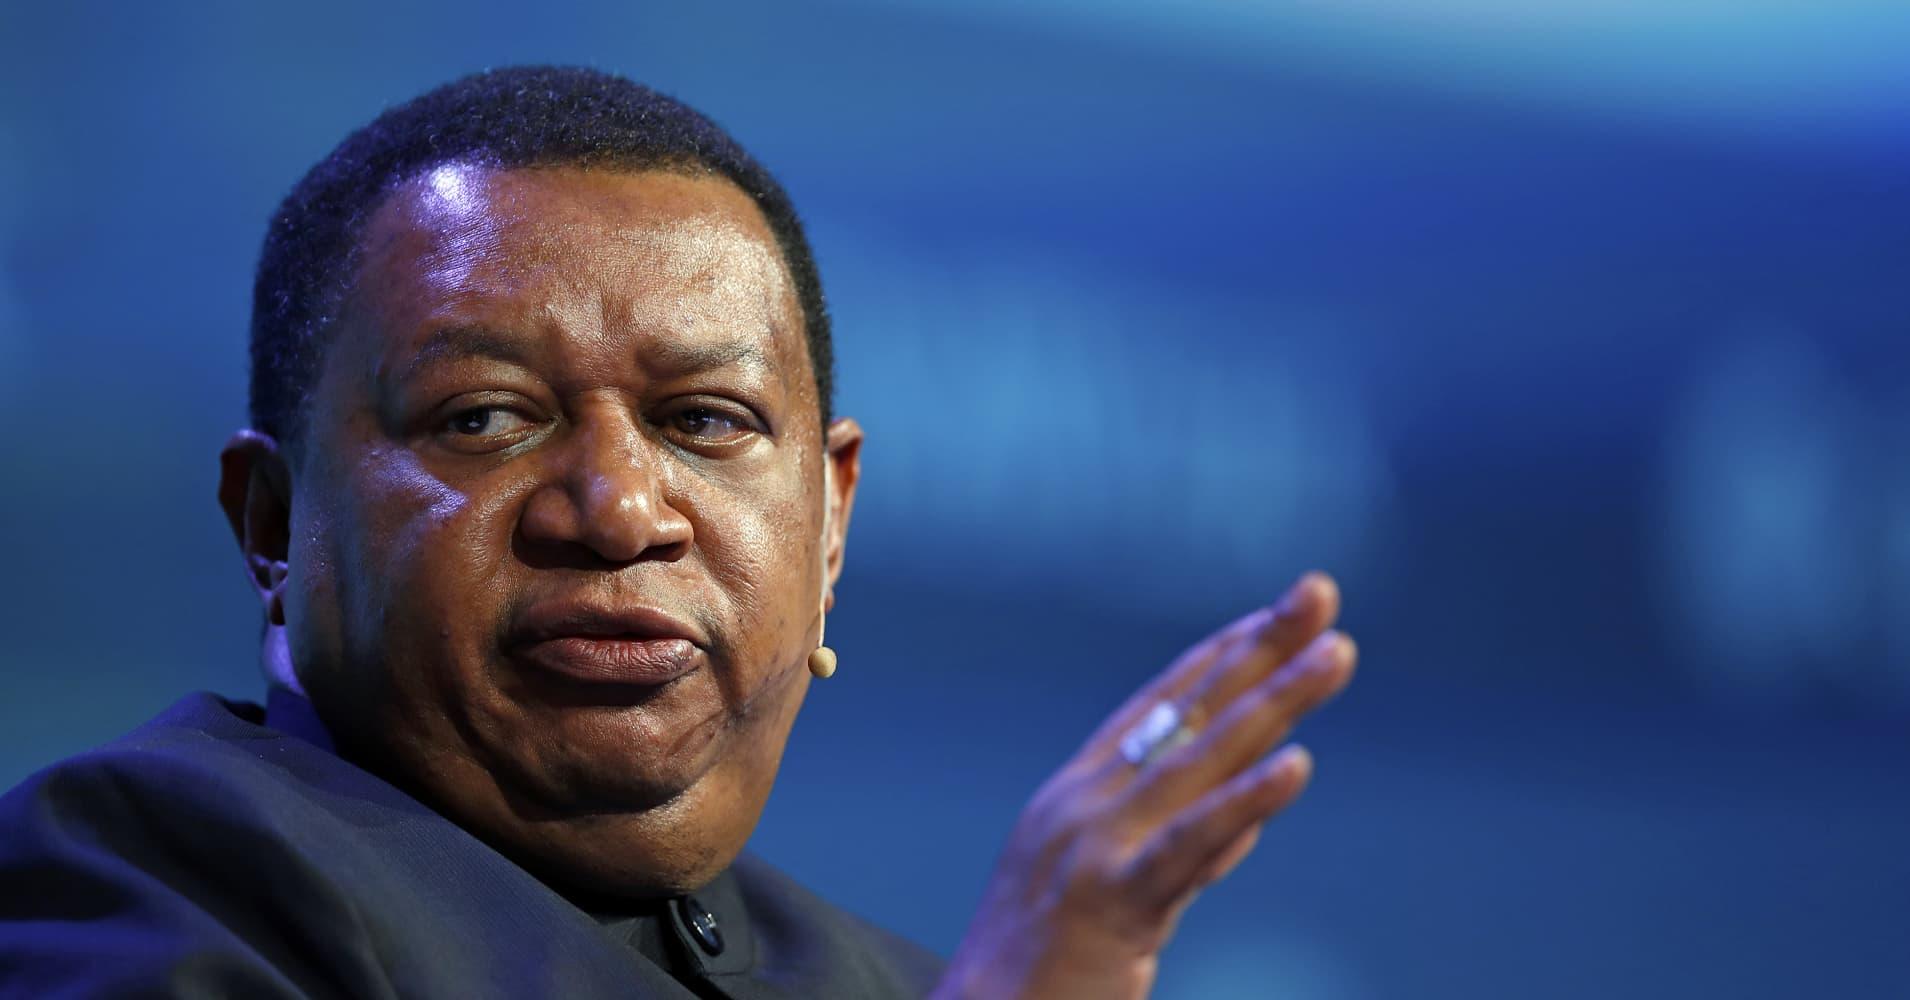 OPEC Secretary General Mohammed Barkindo worried about trade war